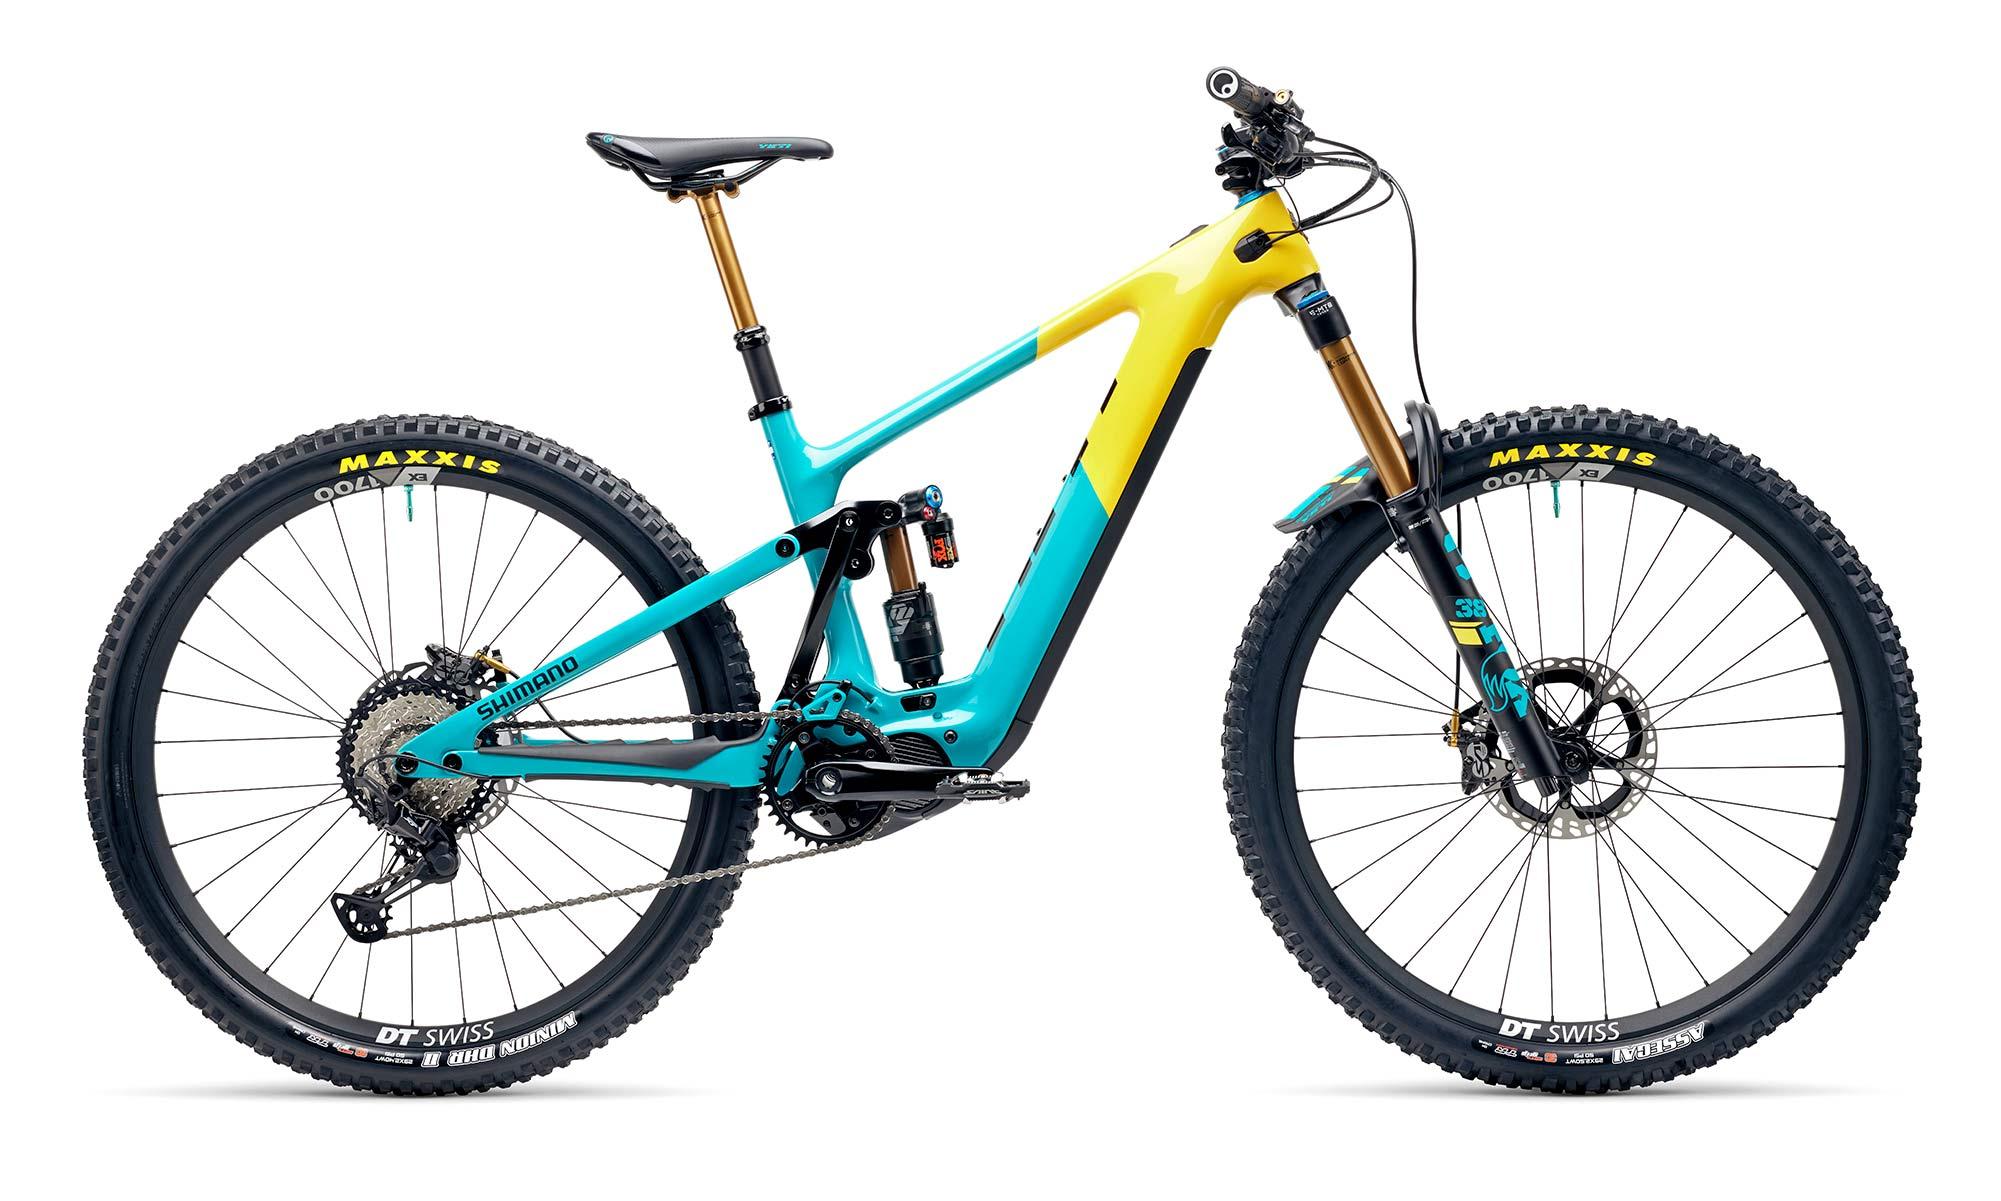 Yeti 160E EWS racing e-bike, all-new 6-bar suspension carbon 160mm eMTB,team edition